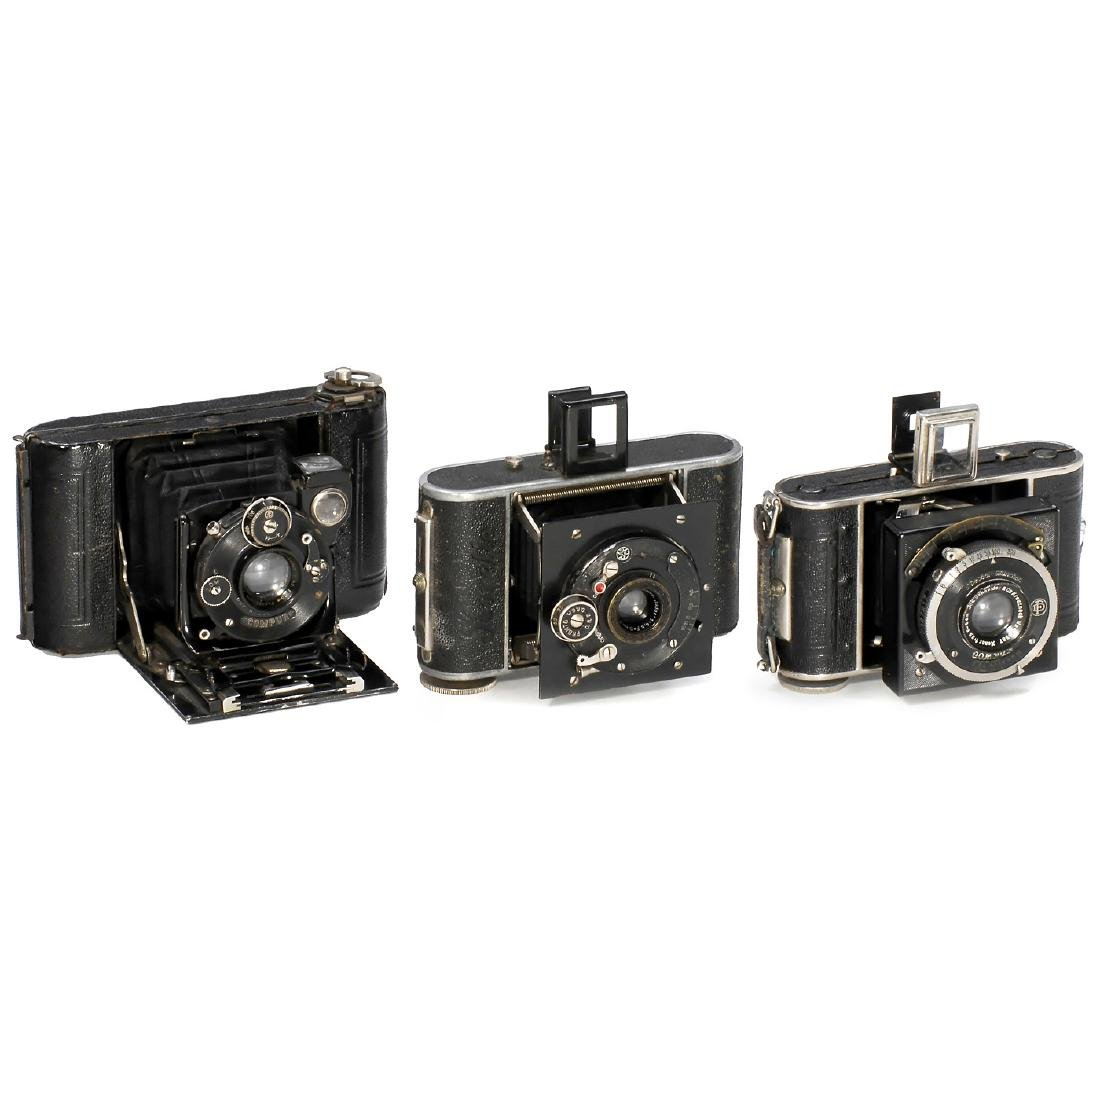 3 Rollfilm Cameras